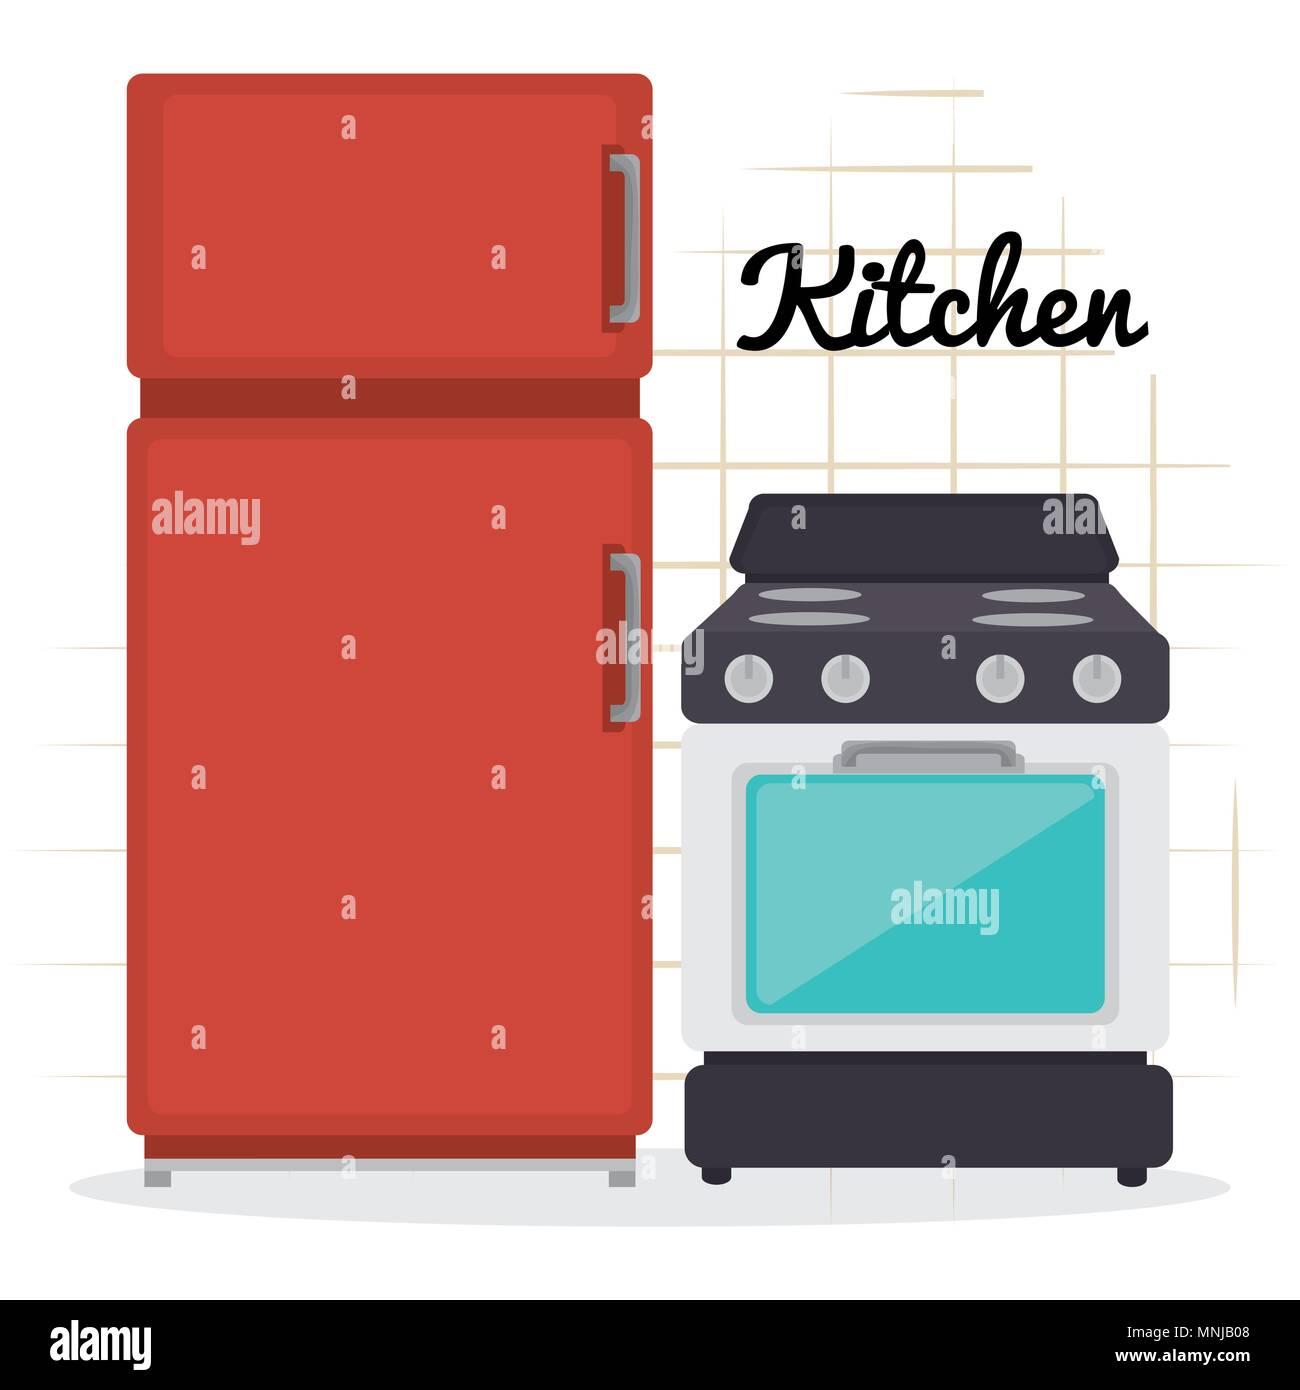 kitchen utensils equipment icons - Stock Vector